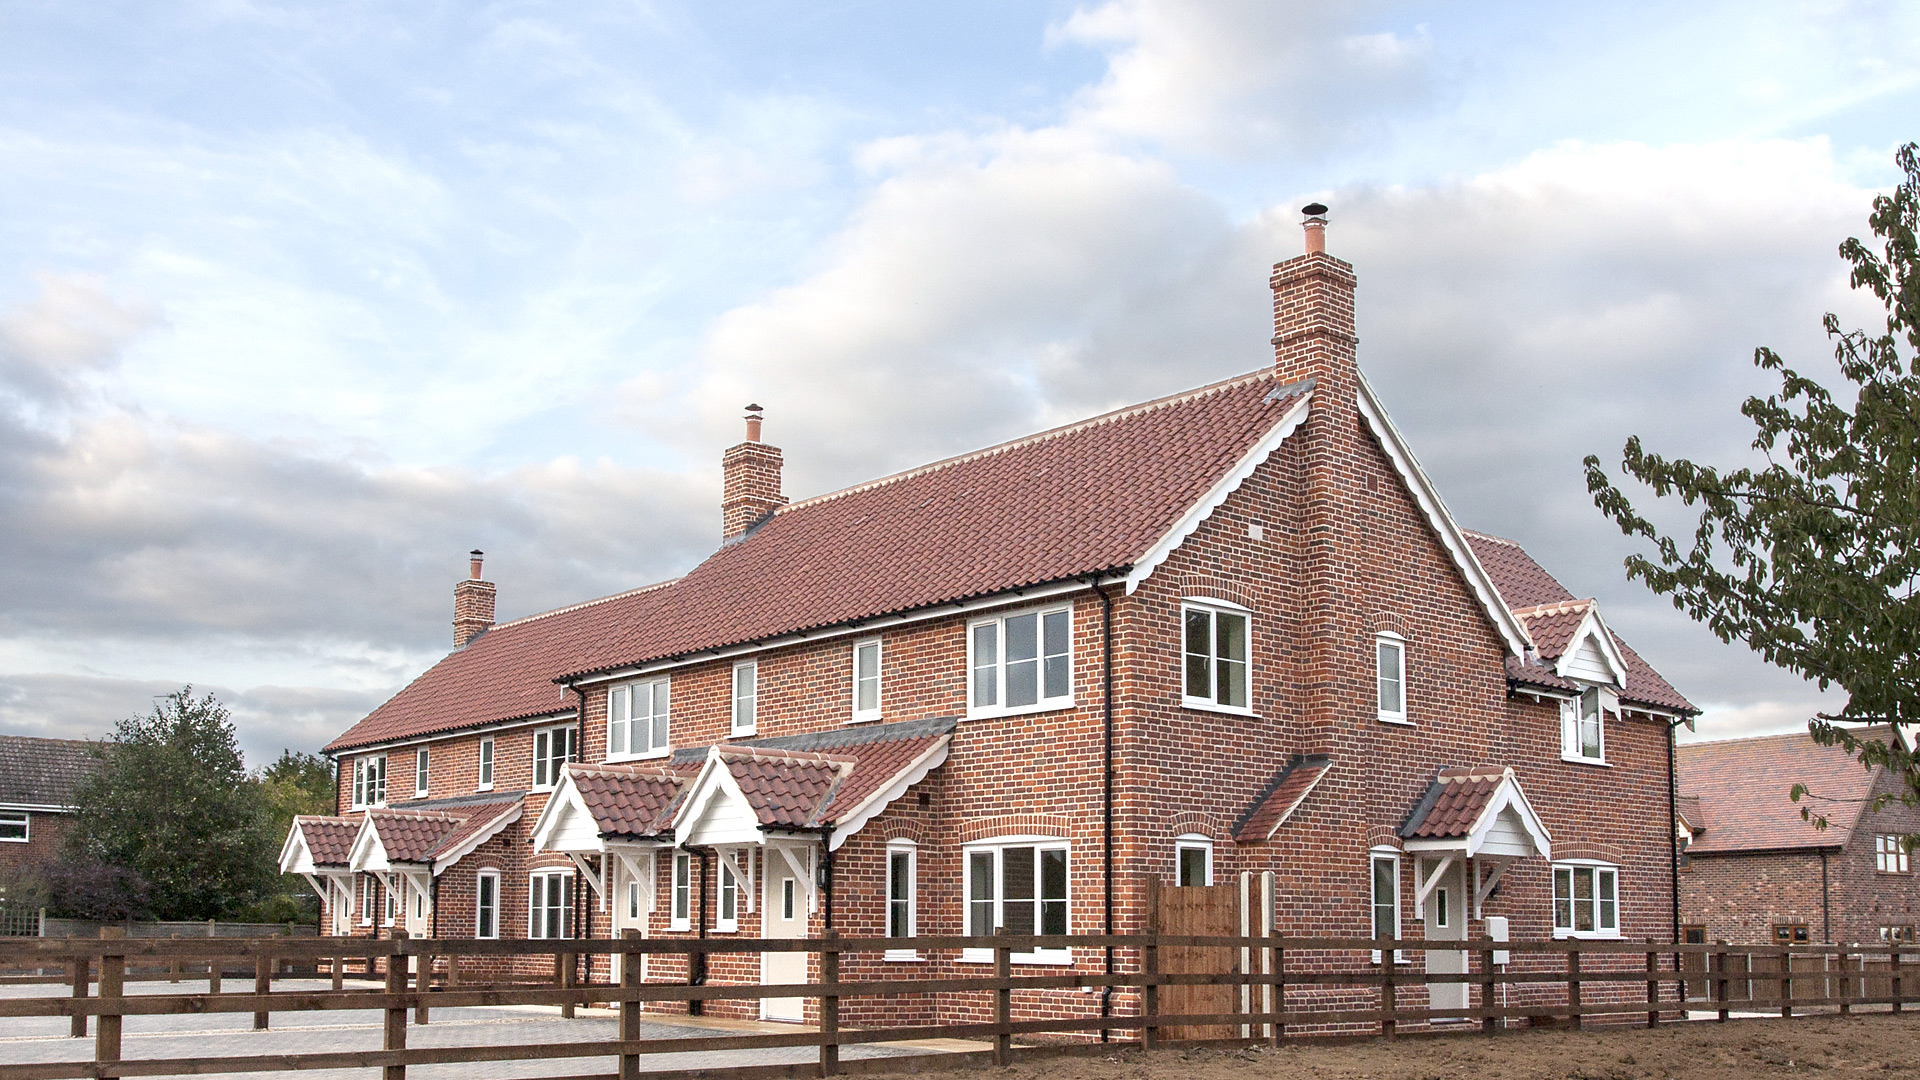 cs-bradfield-cottages-5